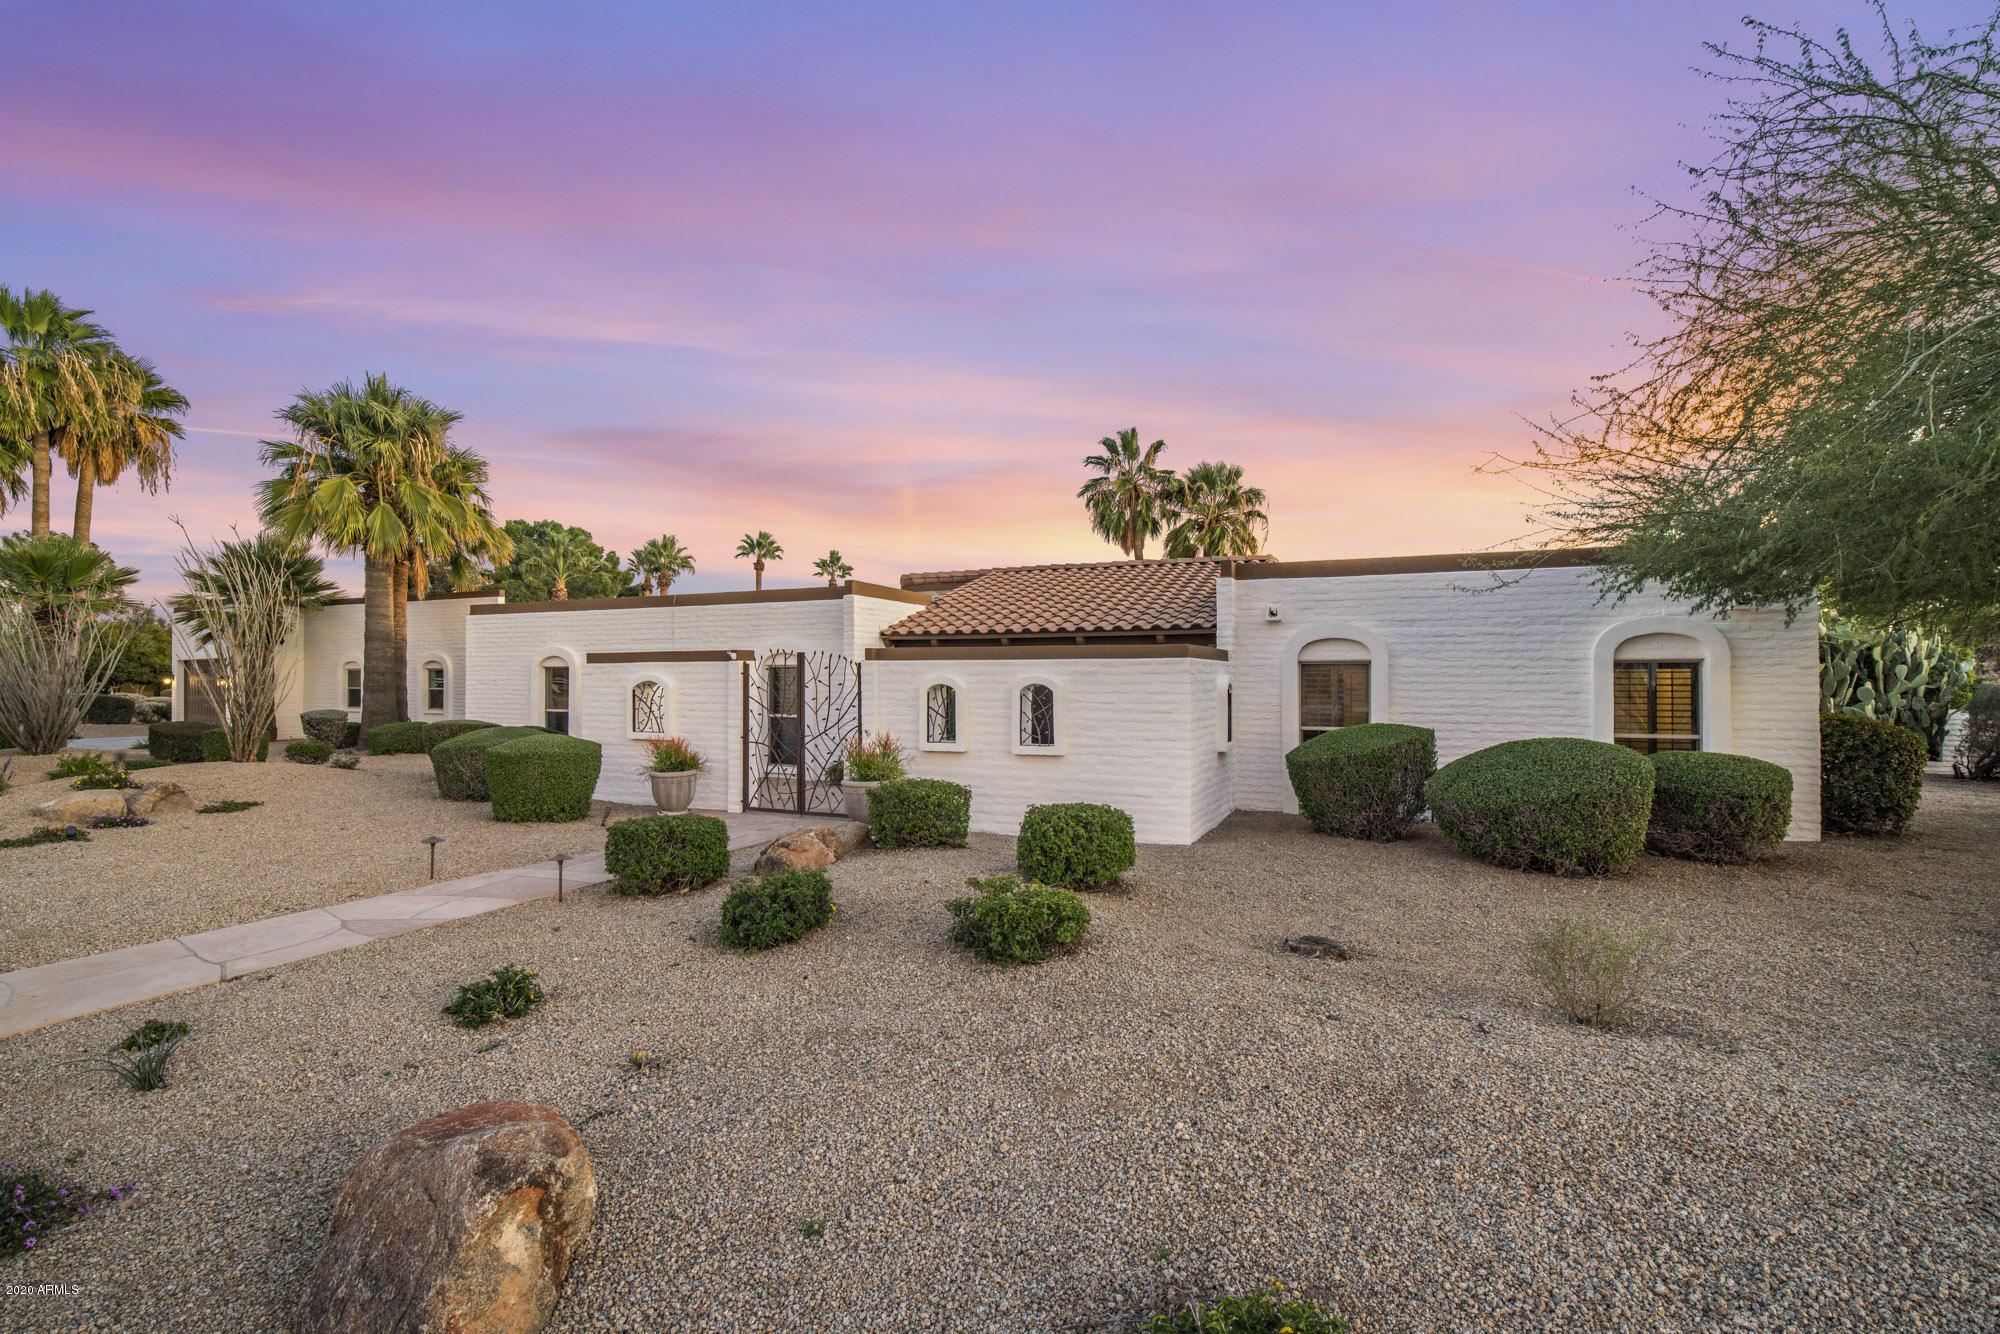 Photo of 1305 N VILLA NUEVA Drive, Litchfield Park, AZ 85340